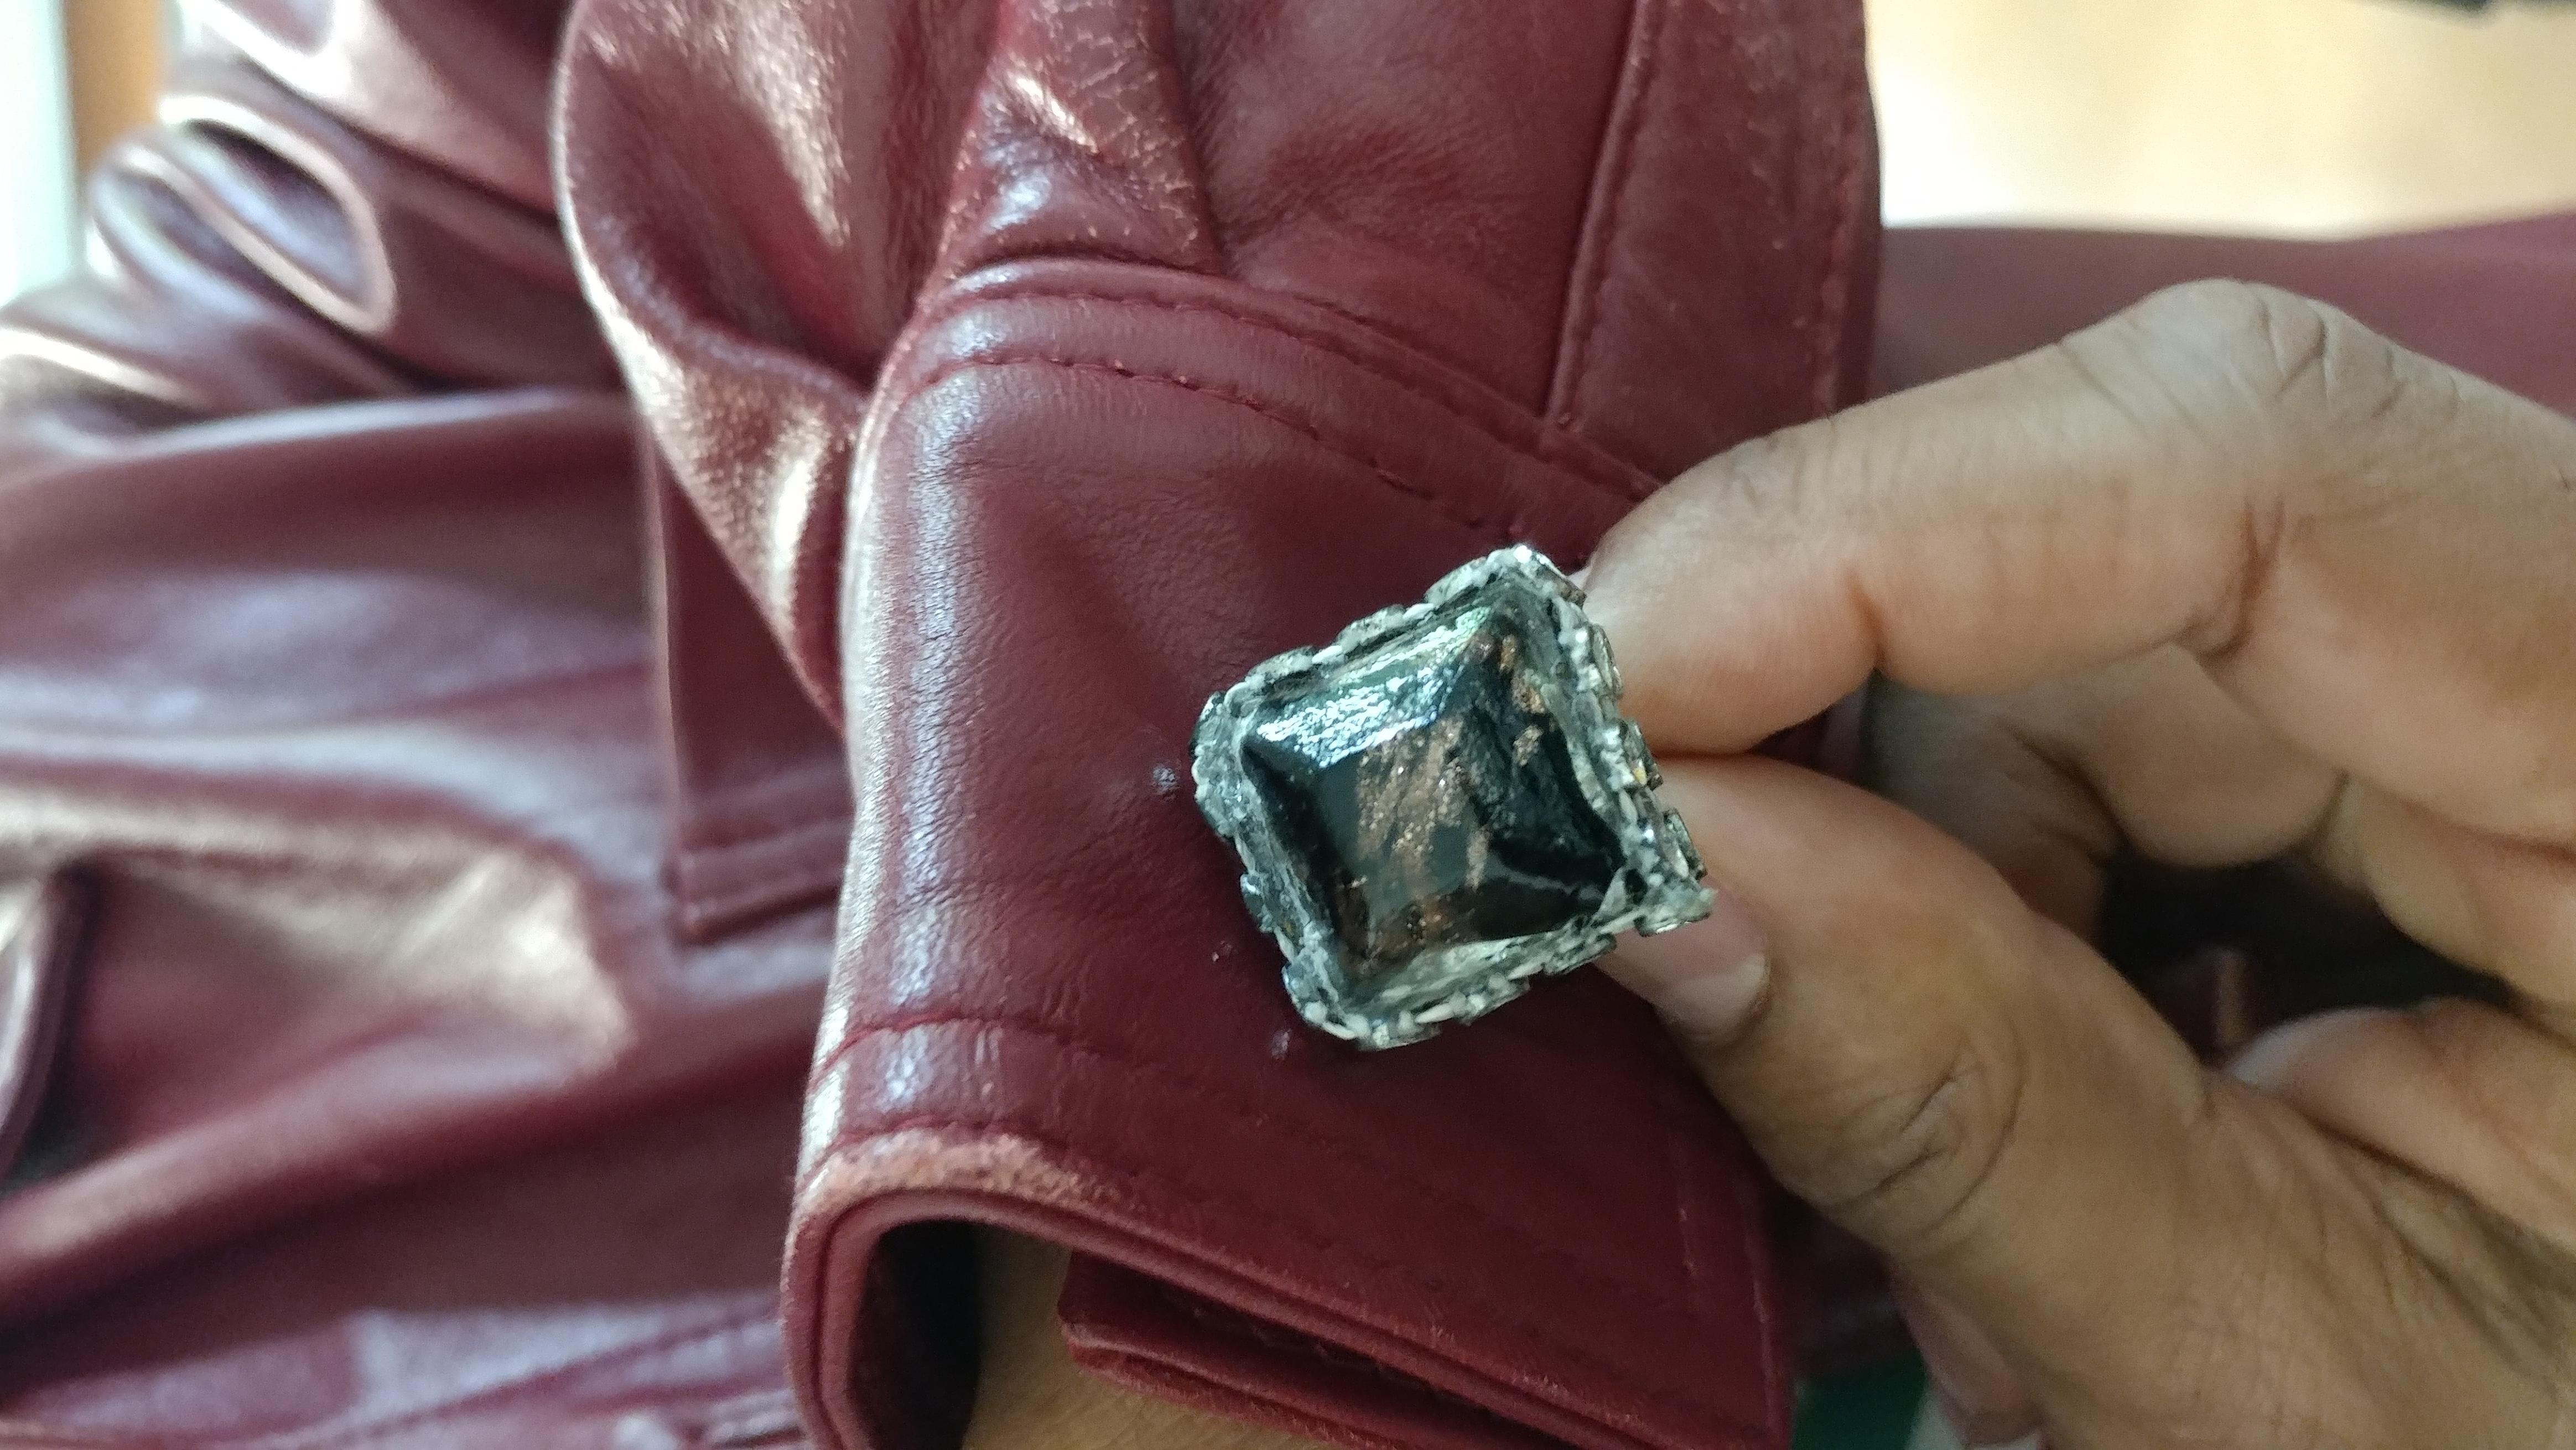 Dicholric glass cufflinks by Nikus